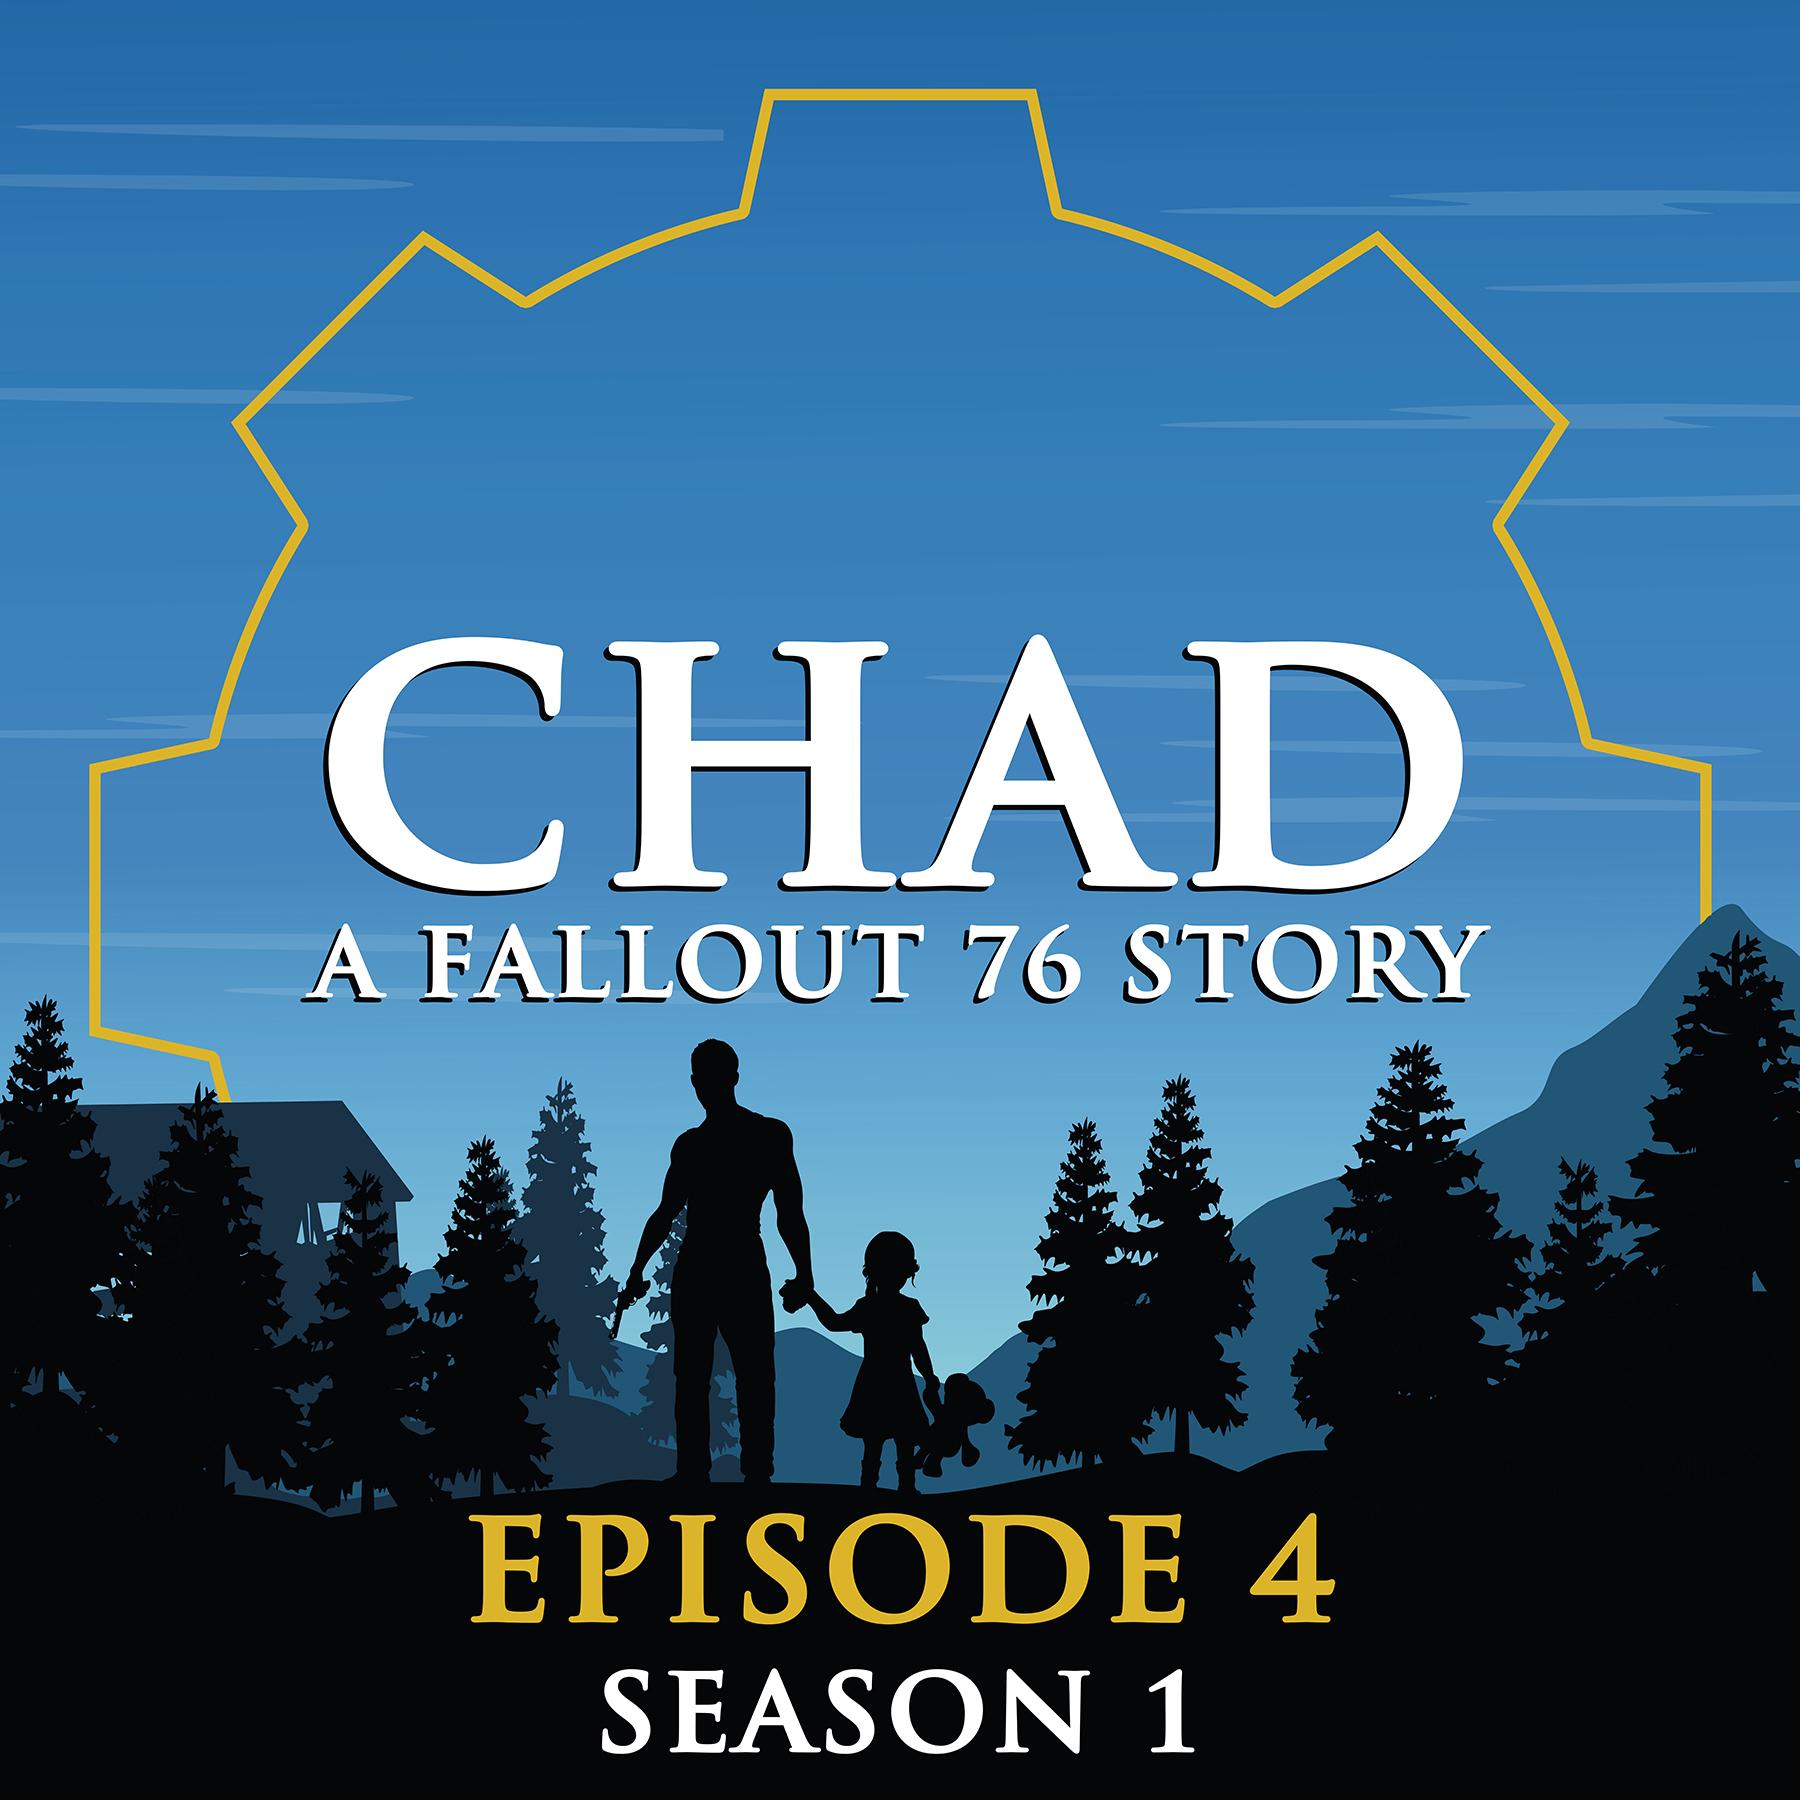 Chad: A Fallout 76 Story Podcast – A fan fiction podcast set